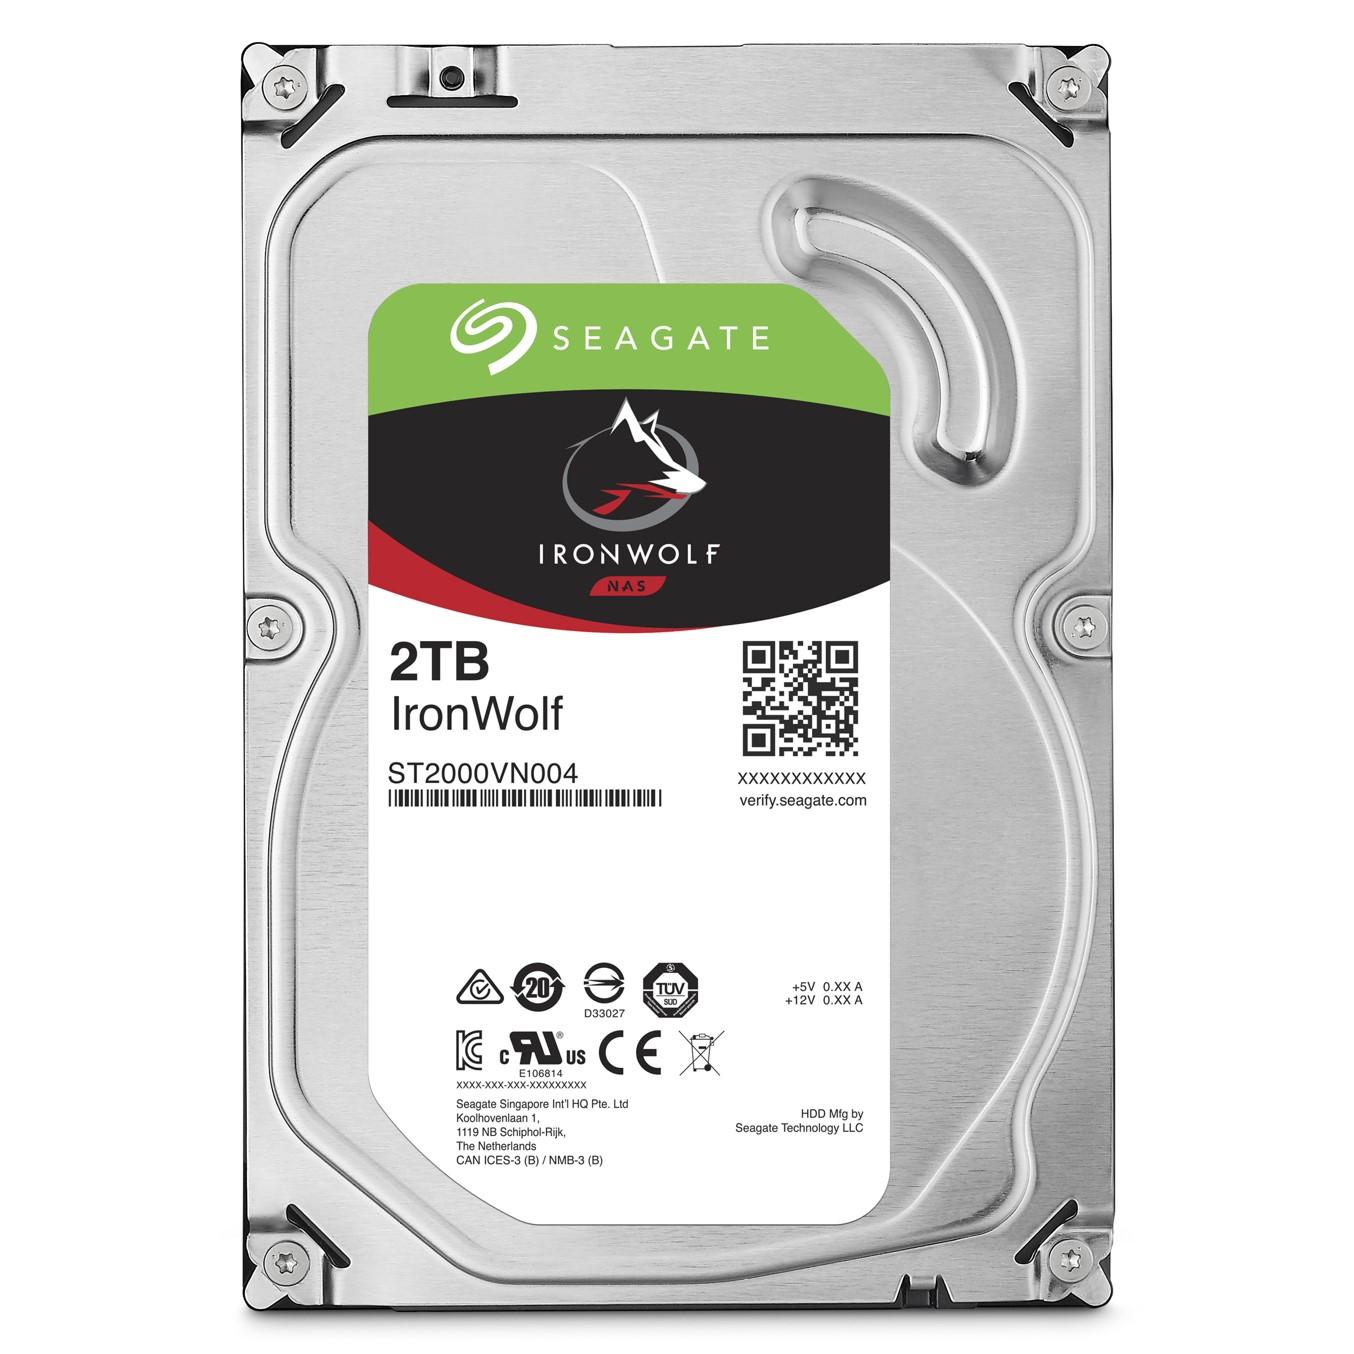 Seagate IronWolf ST2000VN004 - disco duro - 2 TB - SATA 6Gb/s